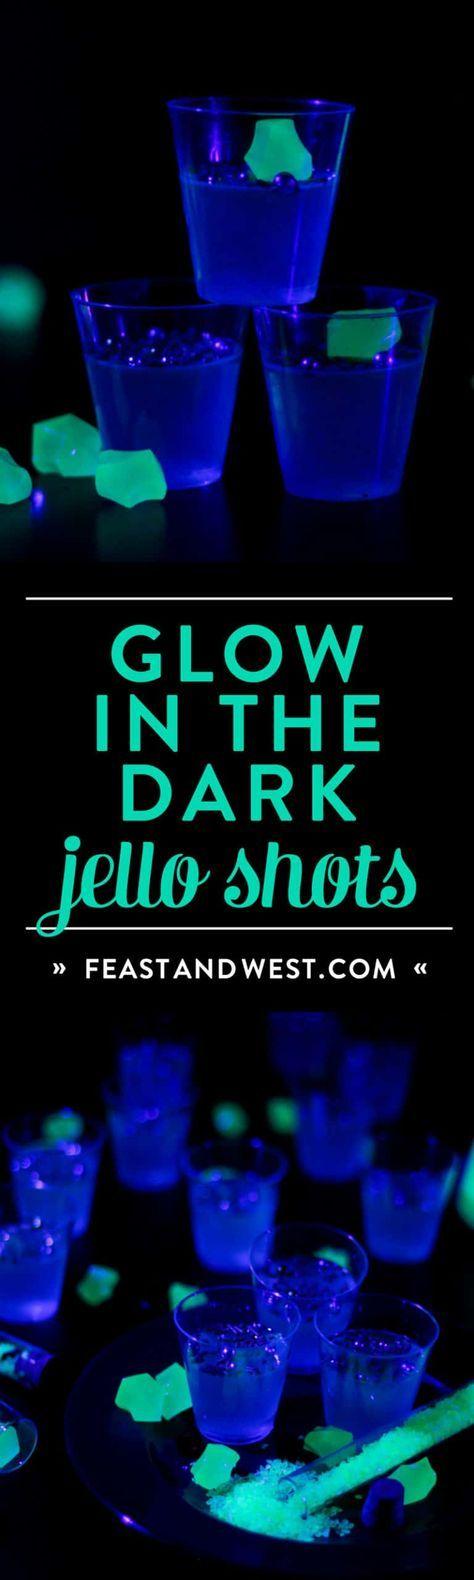 Party glow in the dark jello shots 41 super Ideas #jelloshotsvodka